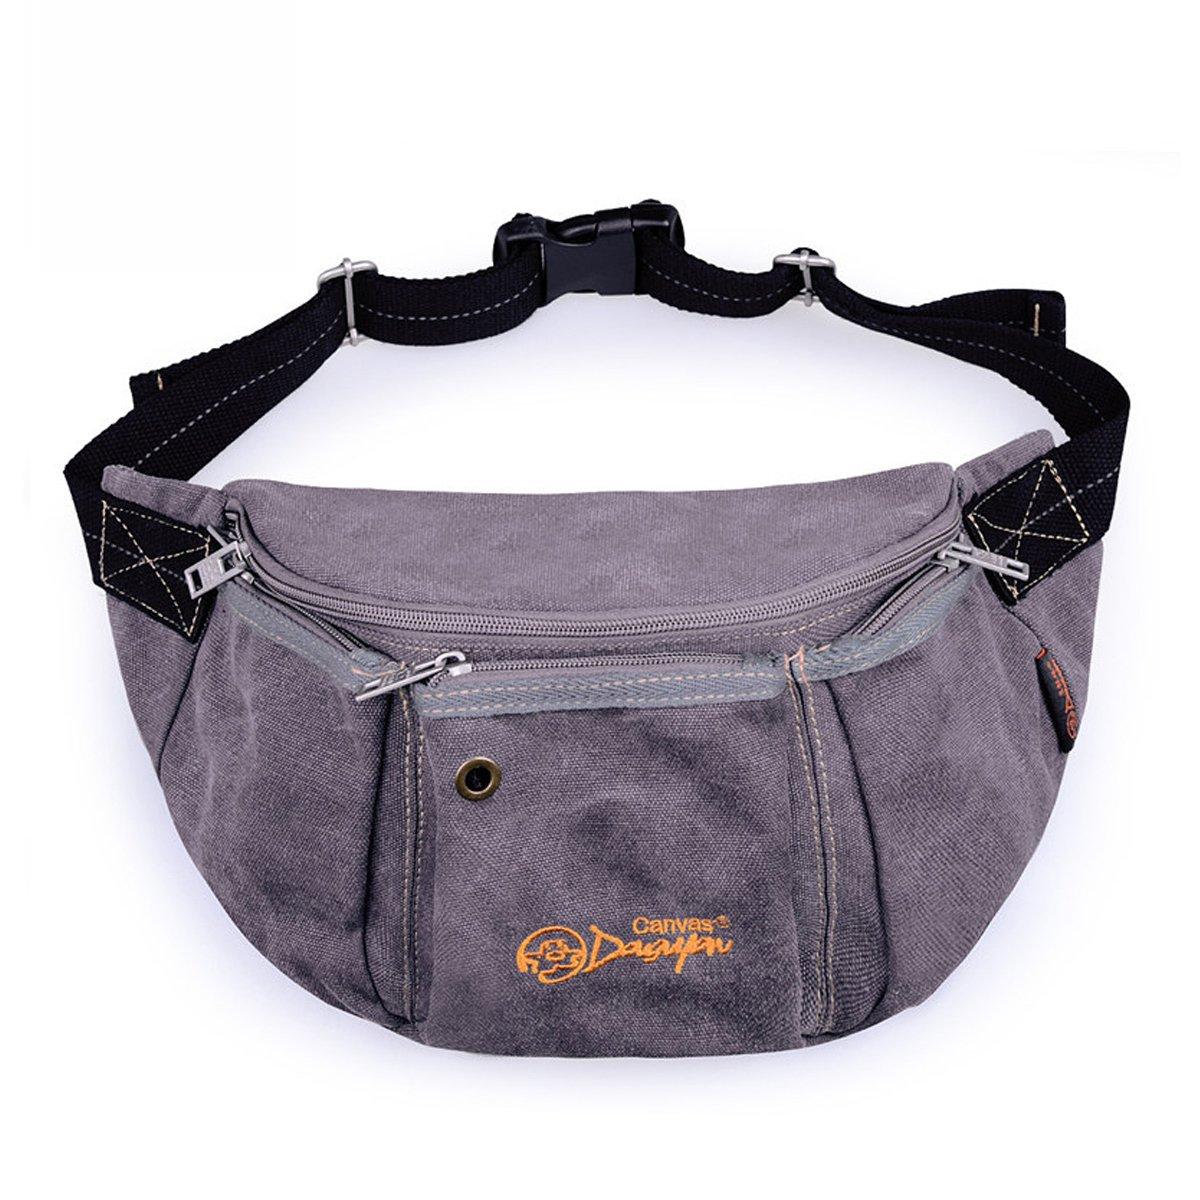 Douguyan Unisex Multifunction Canvas Waist Pack Vintage Fanny Pack Waist Bags Grey 123